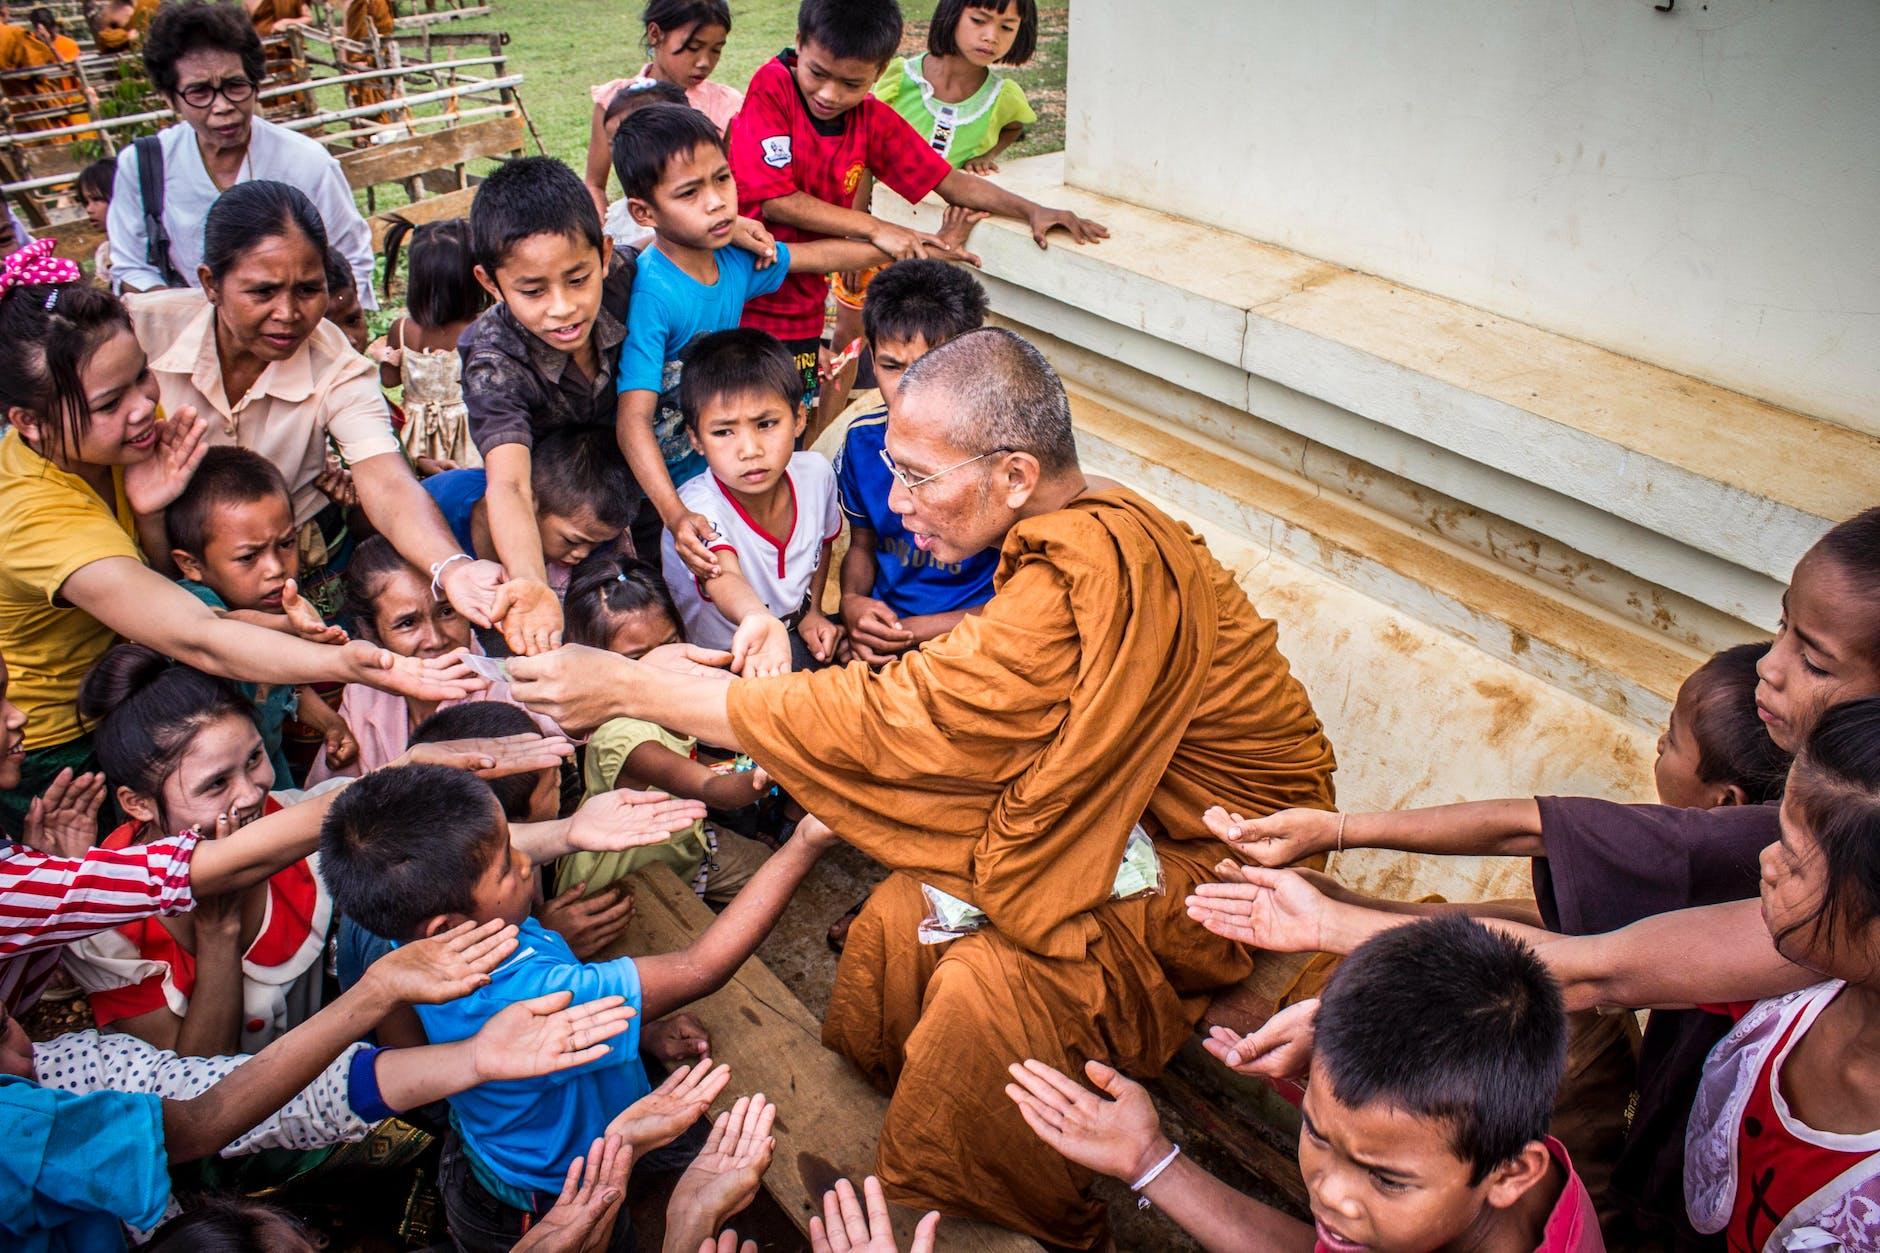 Law of Generosity laws of karma